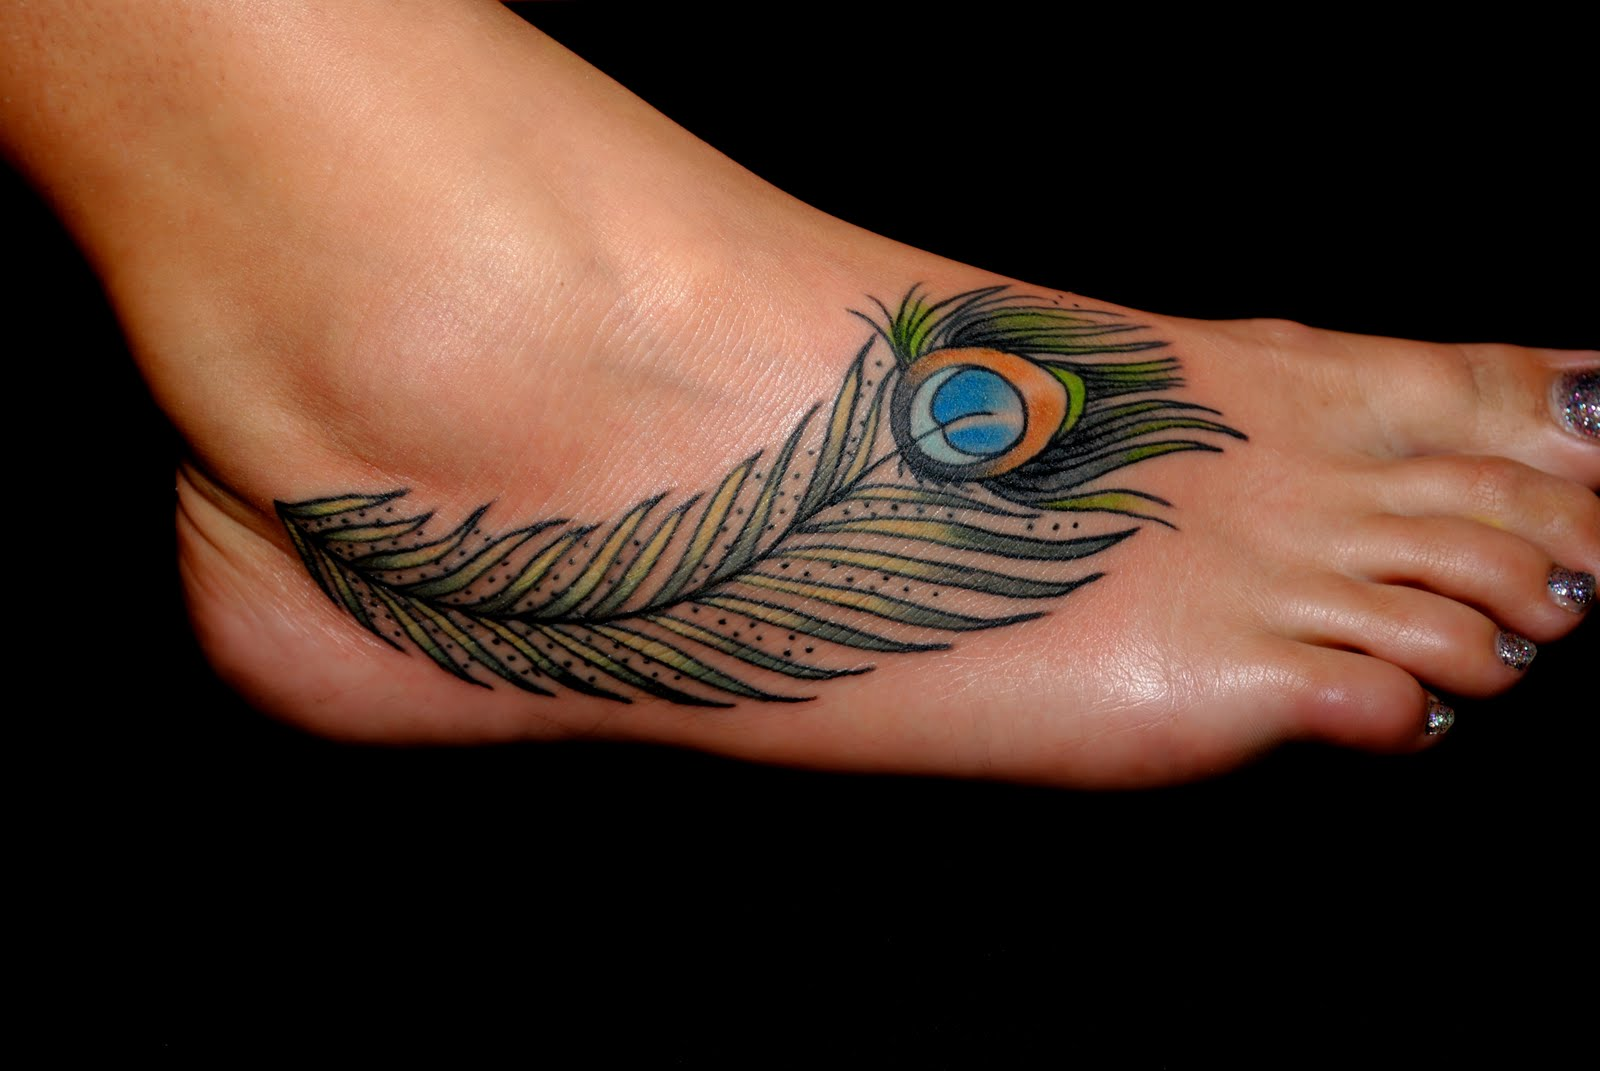 tatouage femme cheville plume paon. Black Bedroom Furniture Sets. Home Design Ideas